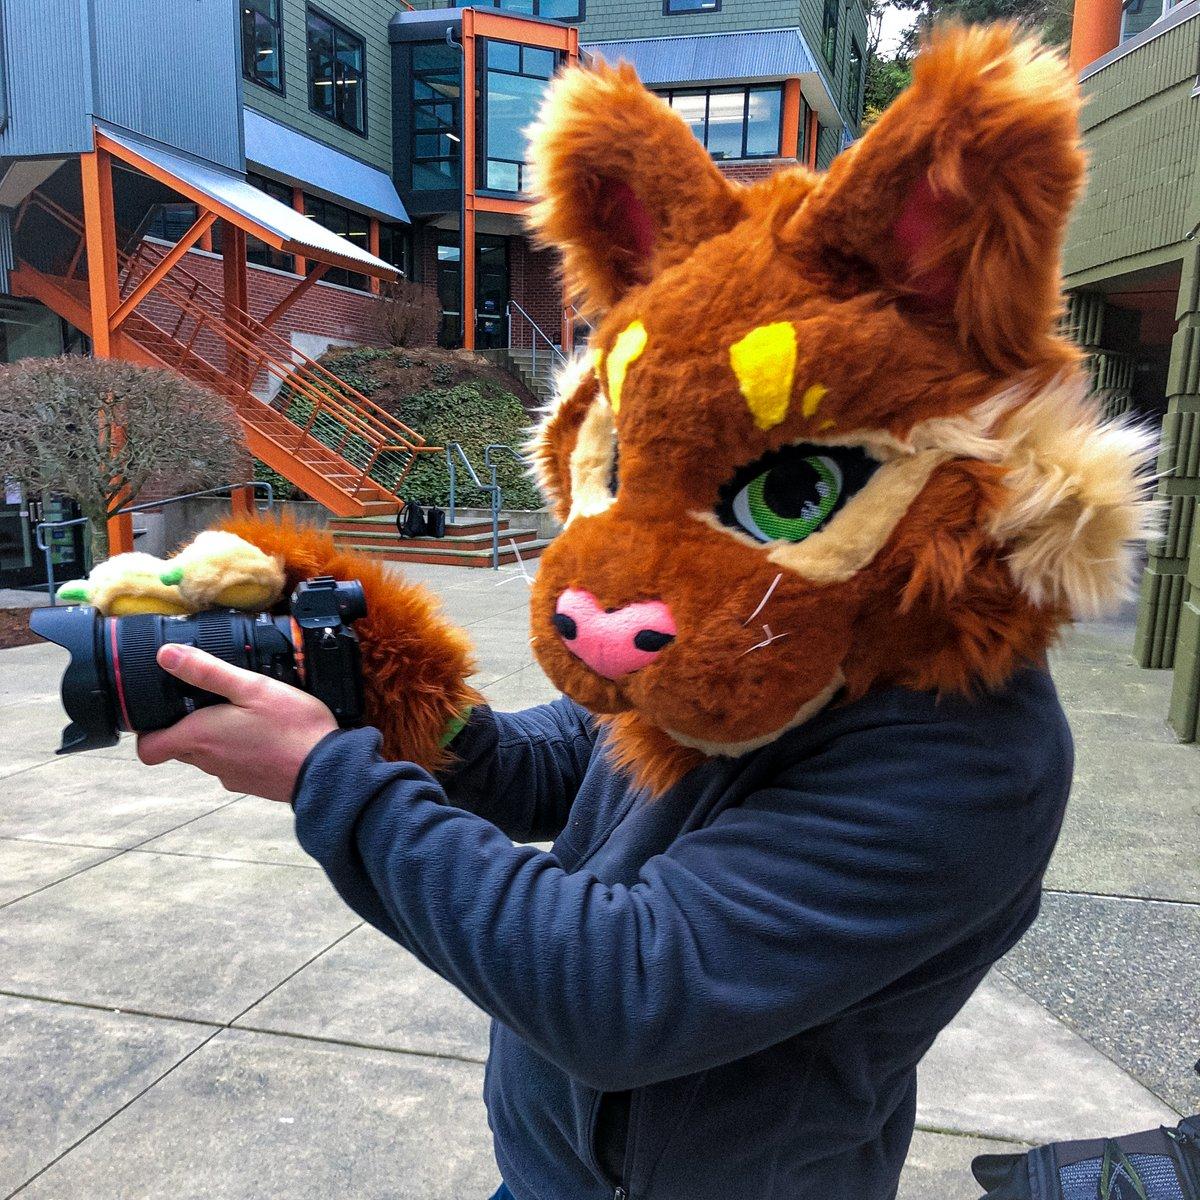 """You gotta be kitten me!"" 😹 Nick having fun as a Wildcat #behindthescenes at Seattle Country Day School @scdscommunity"